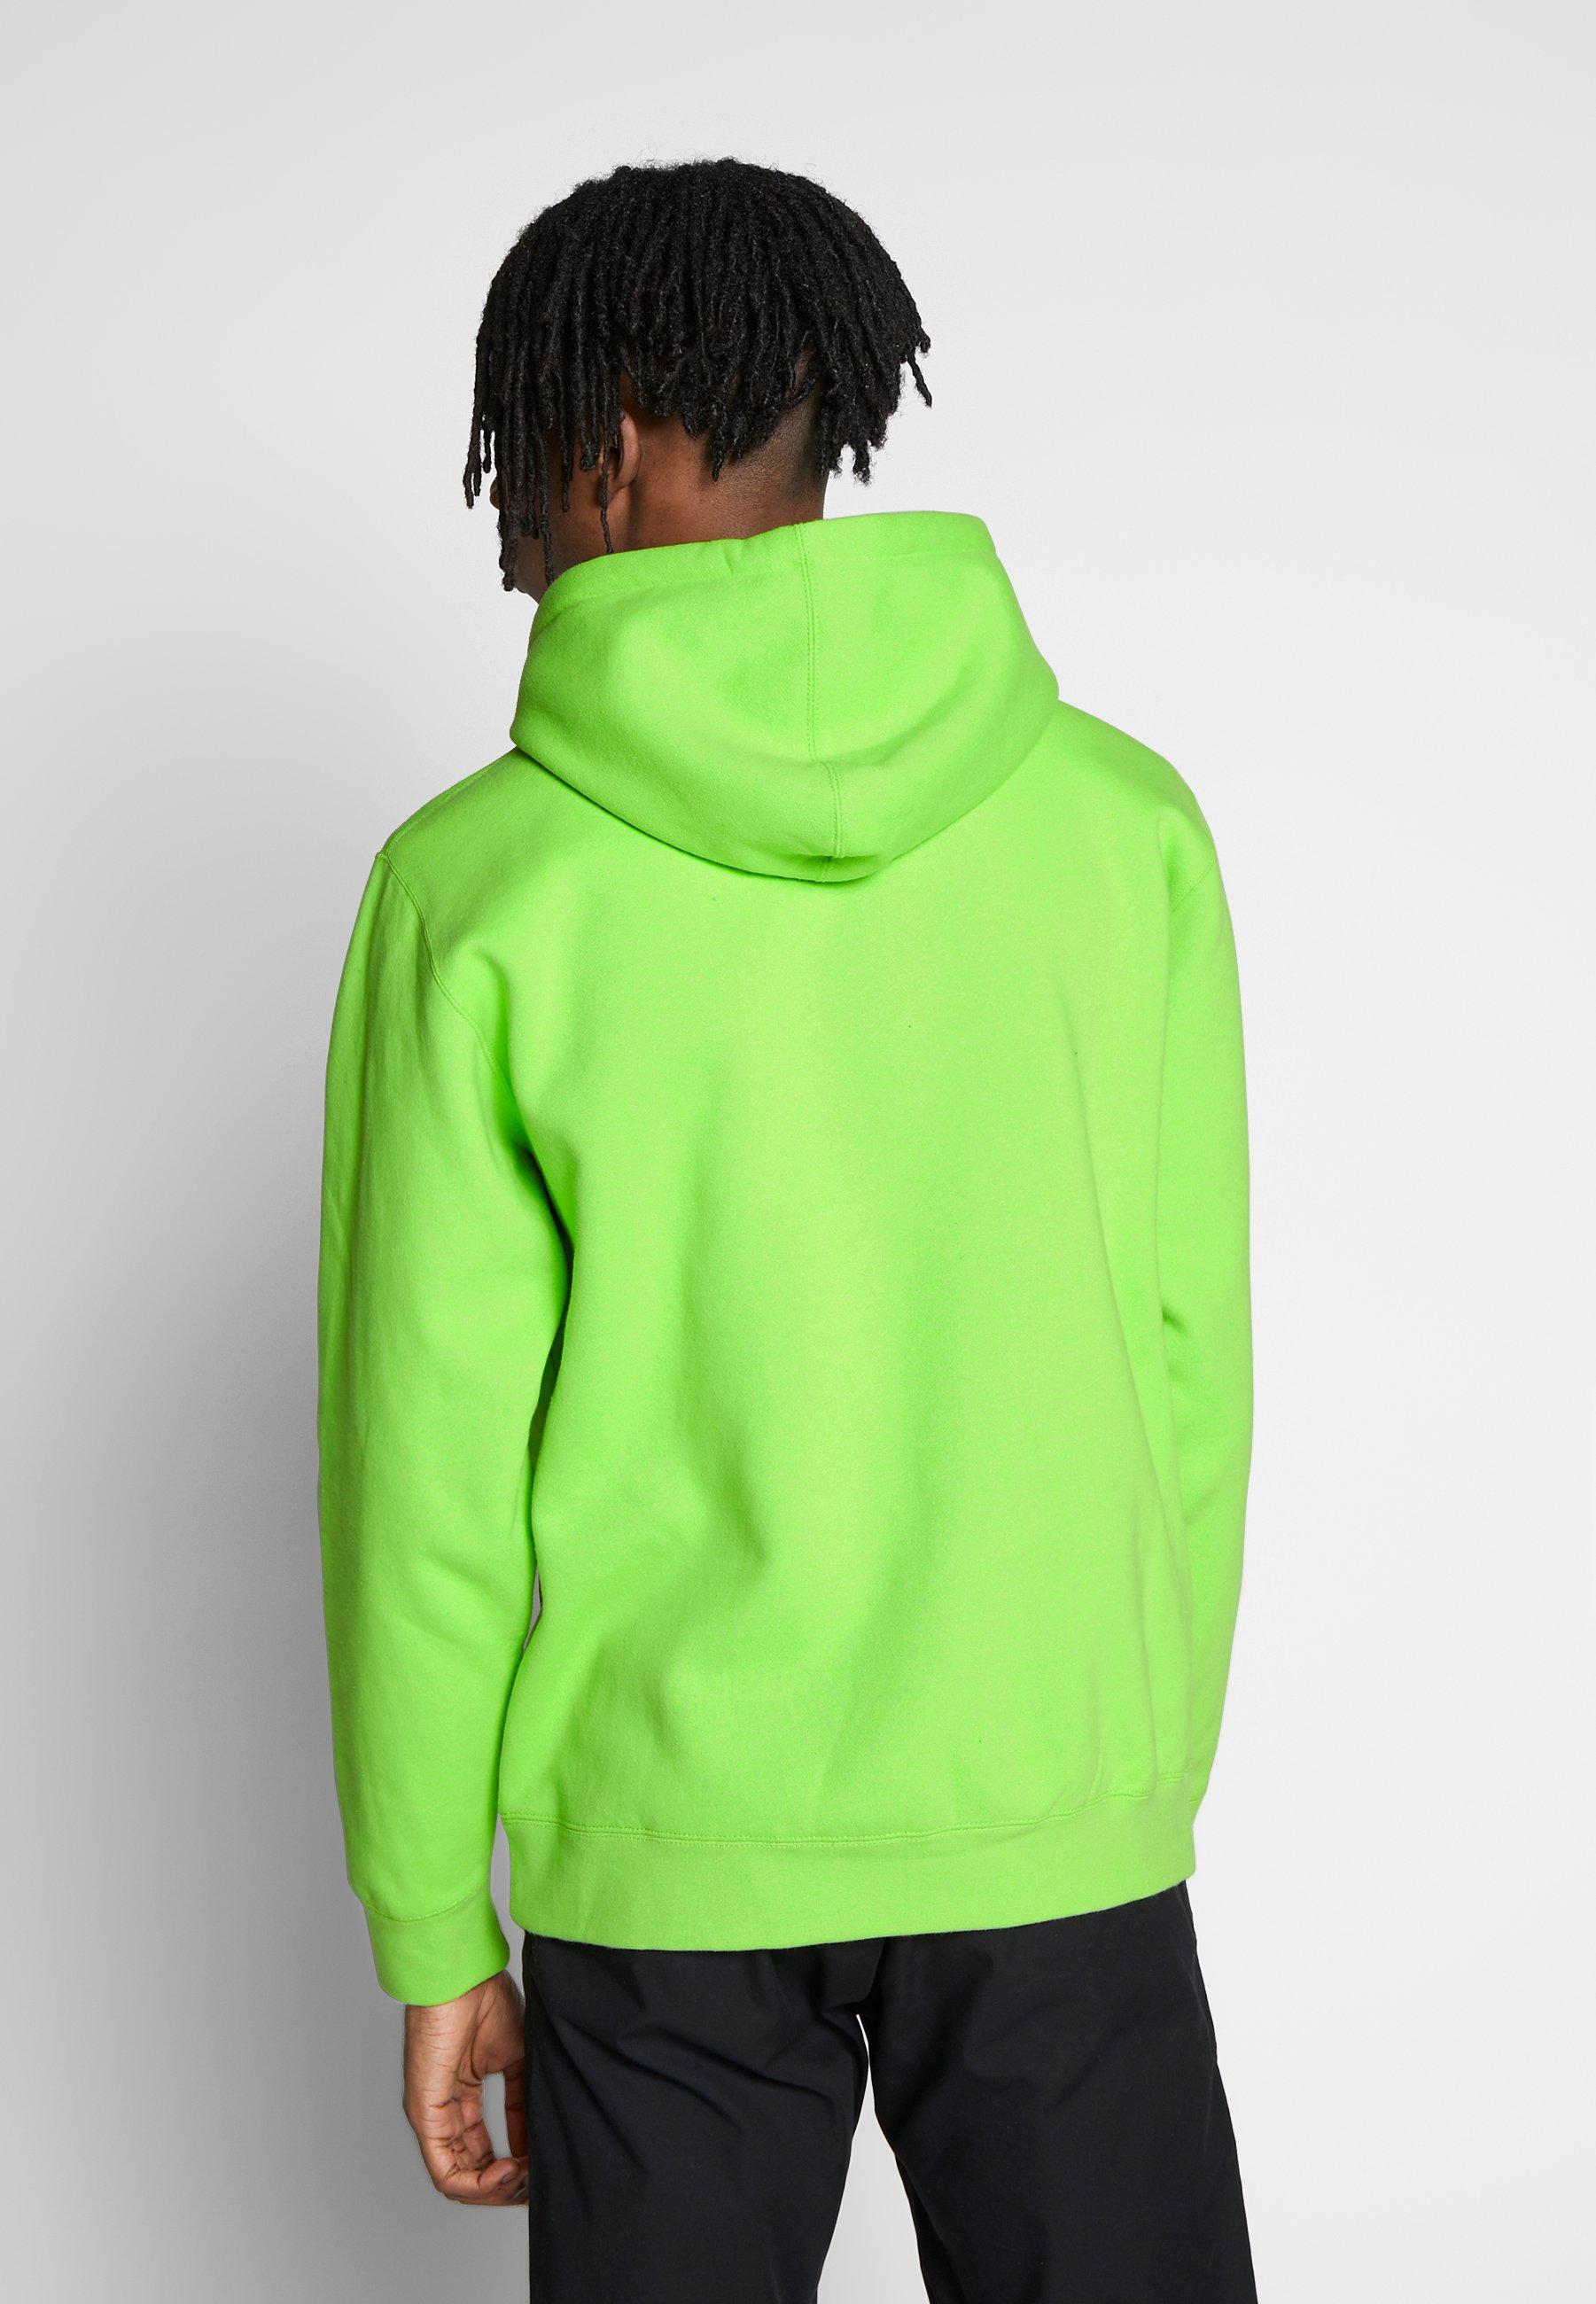 Obey Clothing OUR PLANET - Bluza z kapturem - bright lime